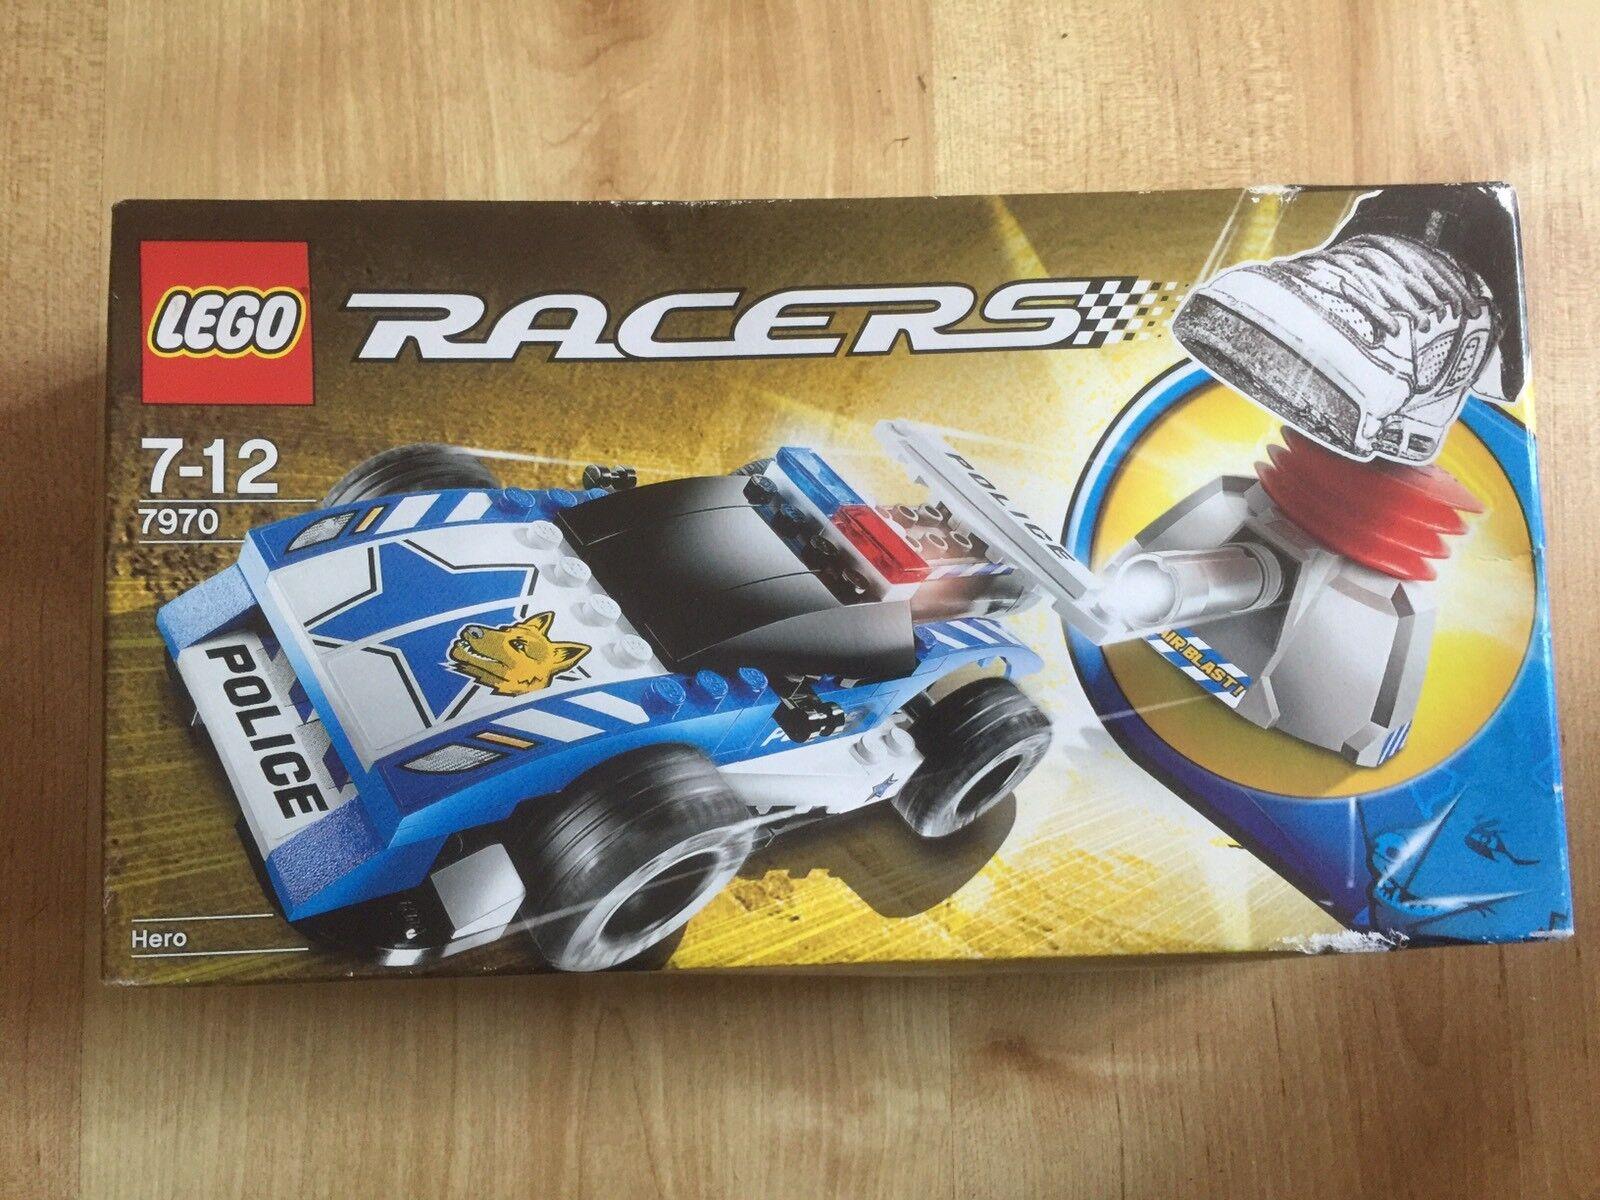 Lego Racers - 7970 Hero - New Boxed